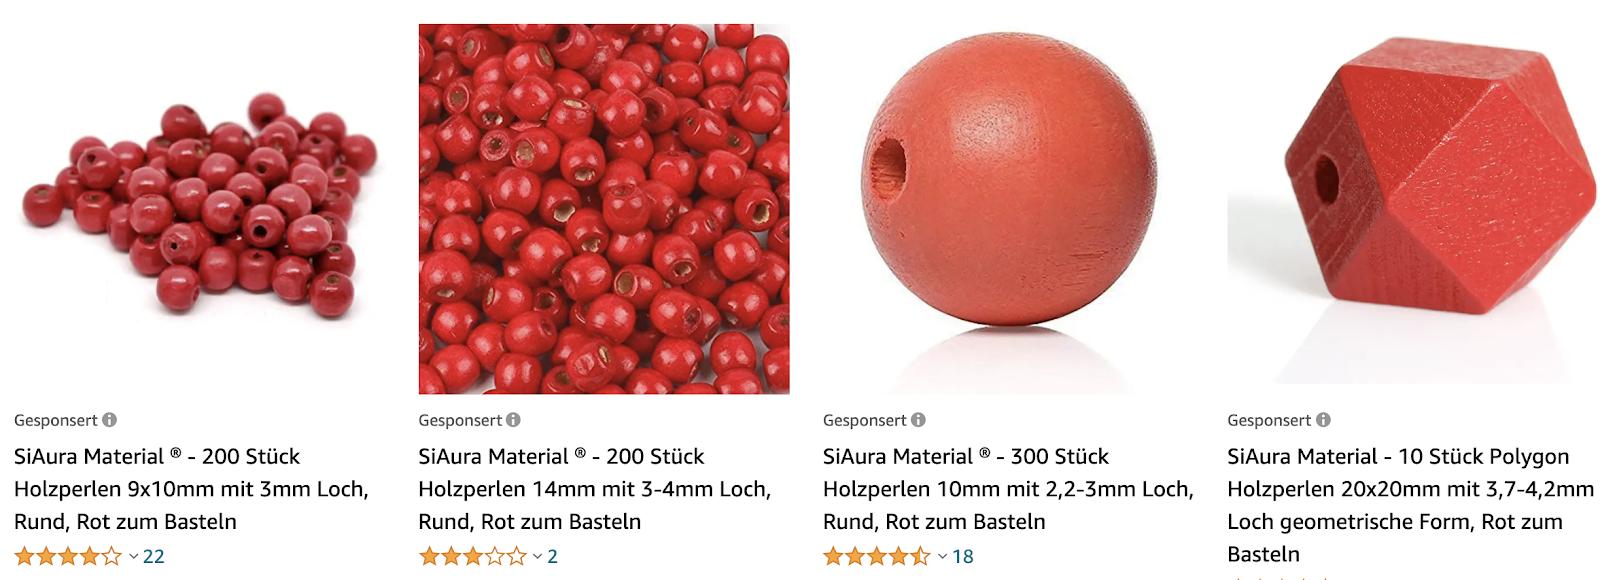 Amazon-PPC-Suchbegriffe-Annemarie-Raluca-Schuster